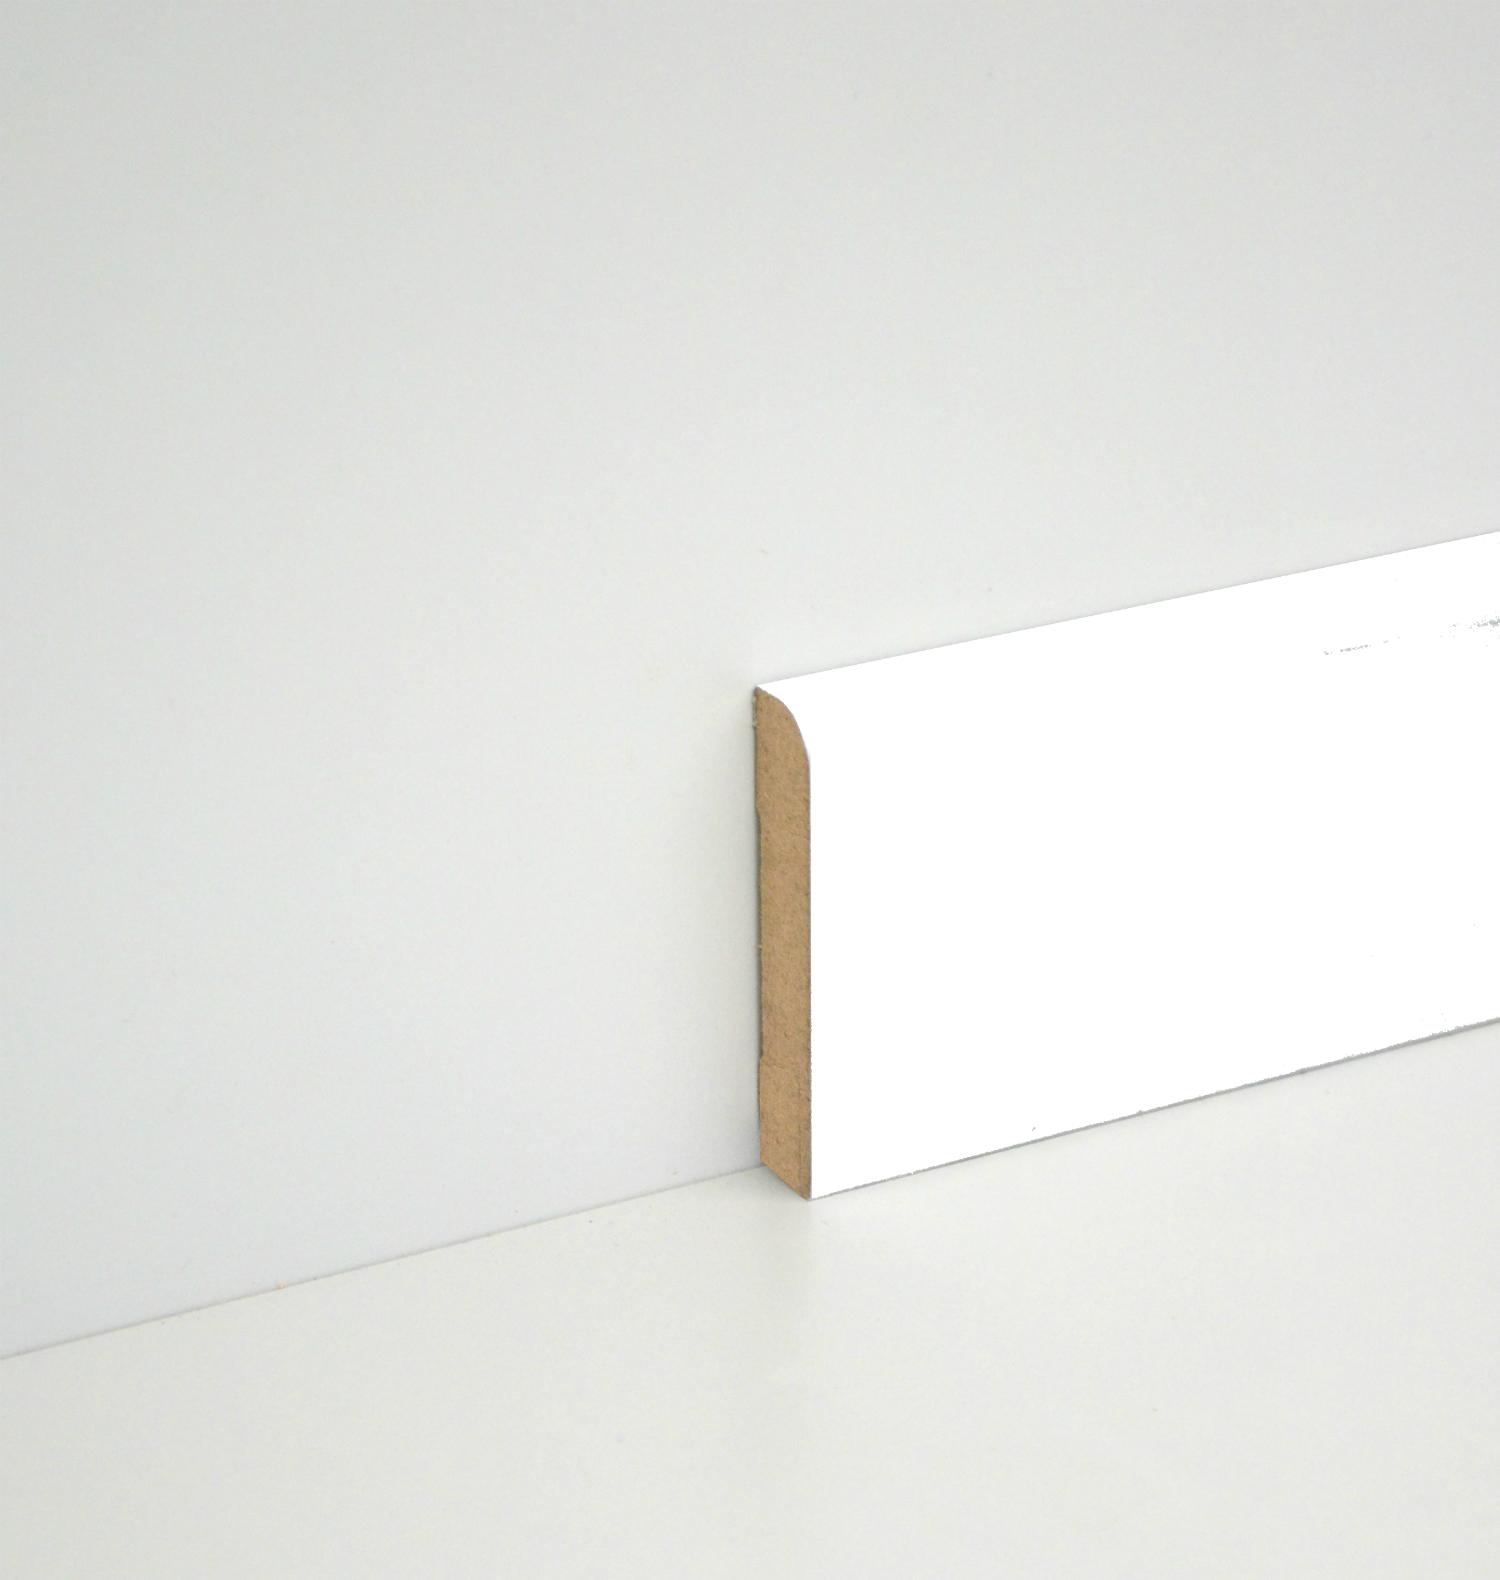 sockelleiste massiv wei lackiert 60mm gerundet. Black Bedroom Furniture Sets. Home Design Ideas